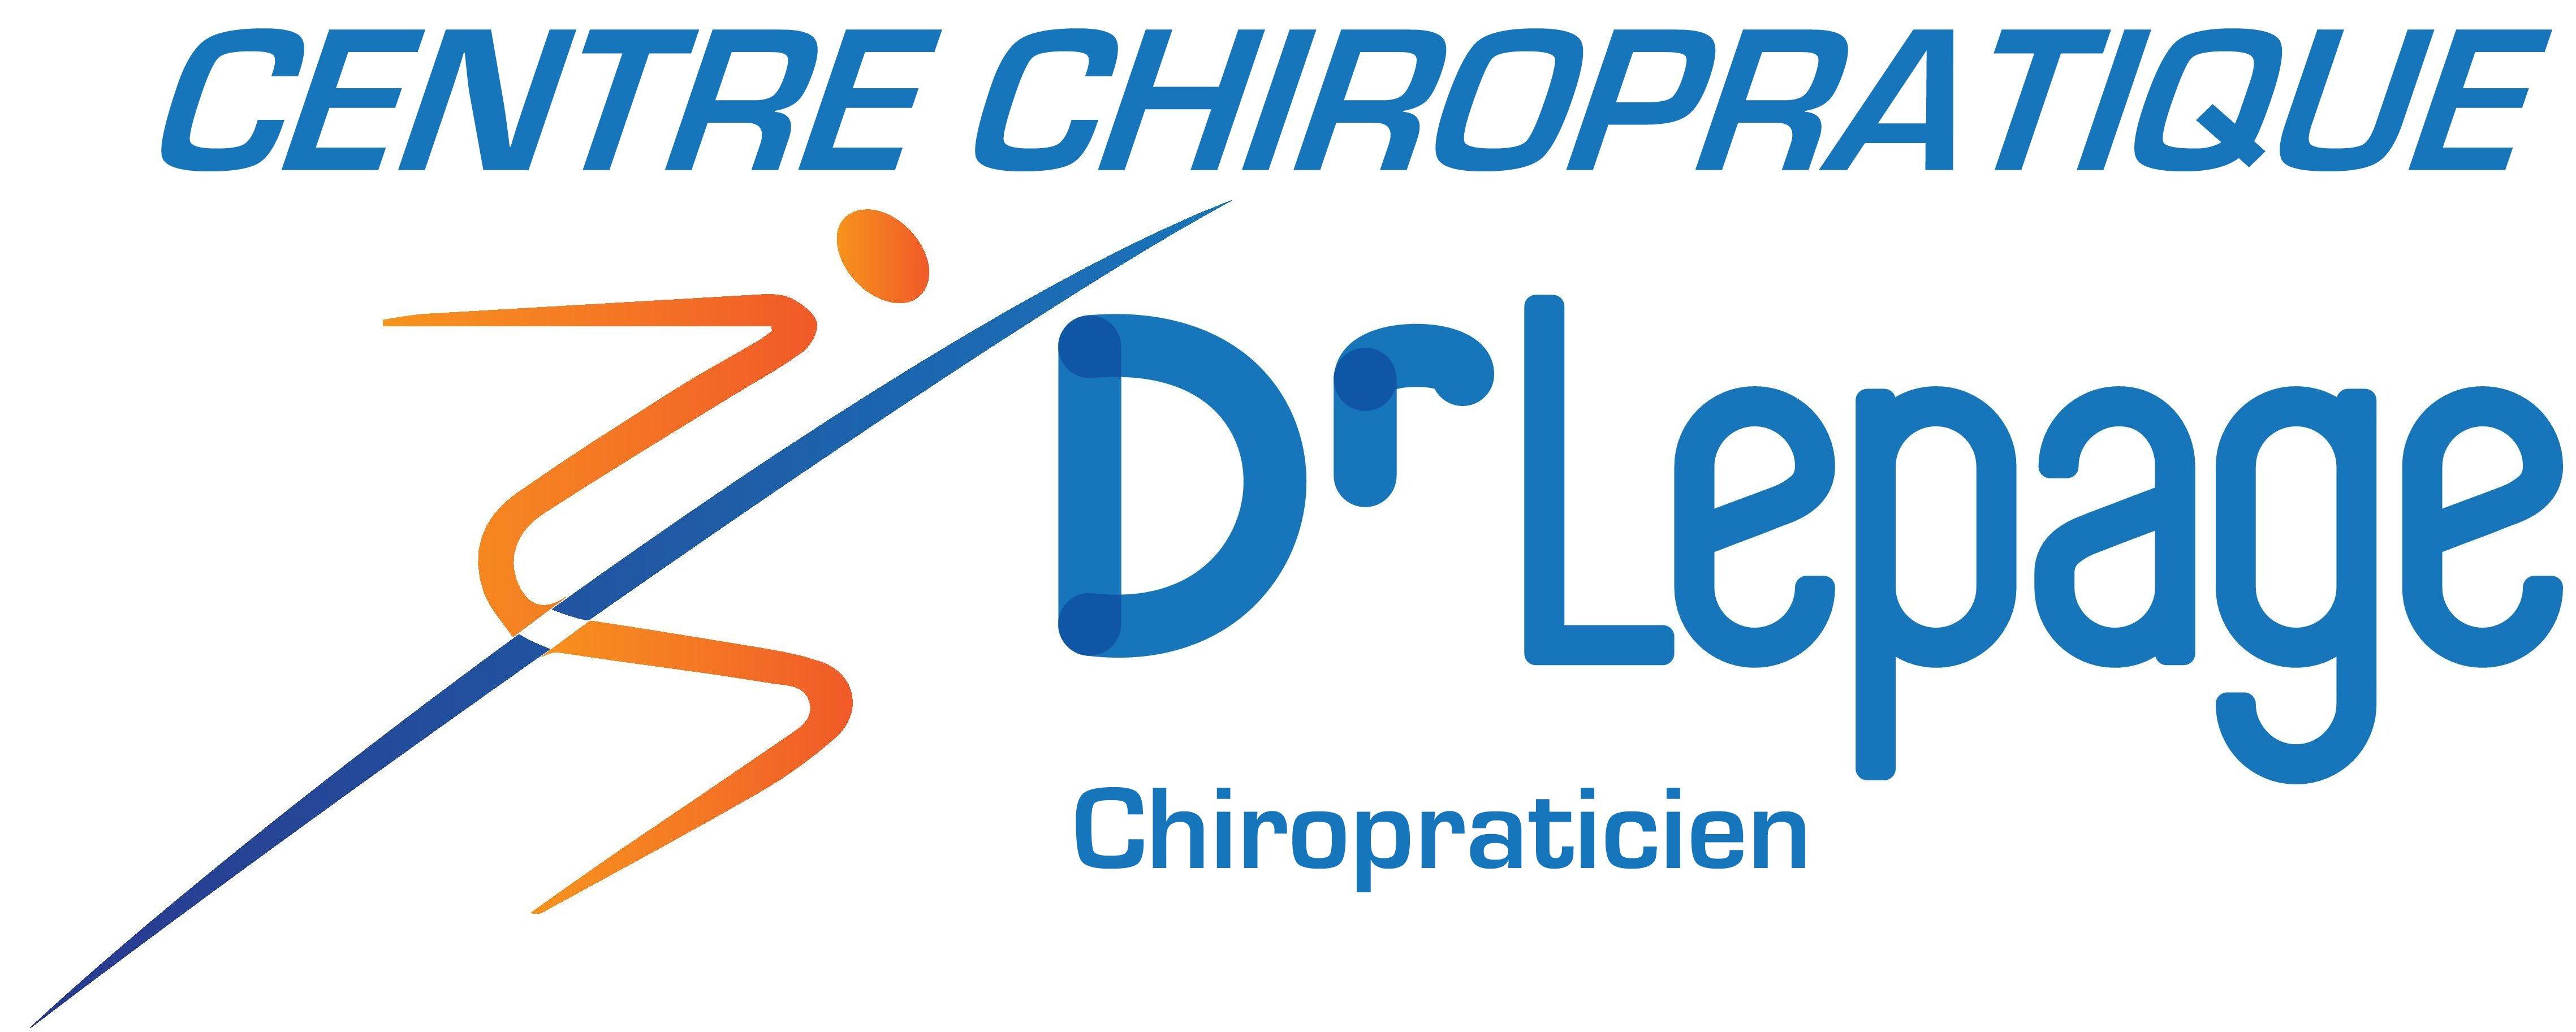 Centre chiropratique Dr Lepage chiropraticien